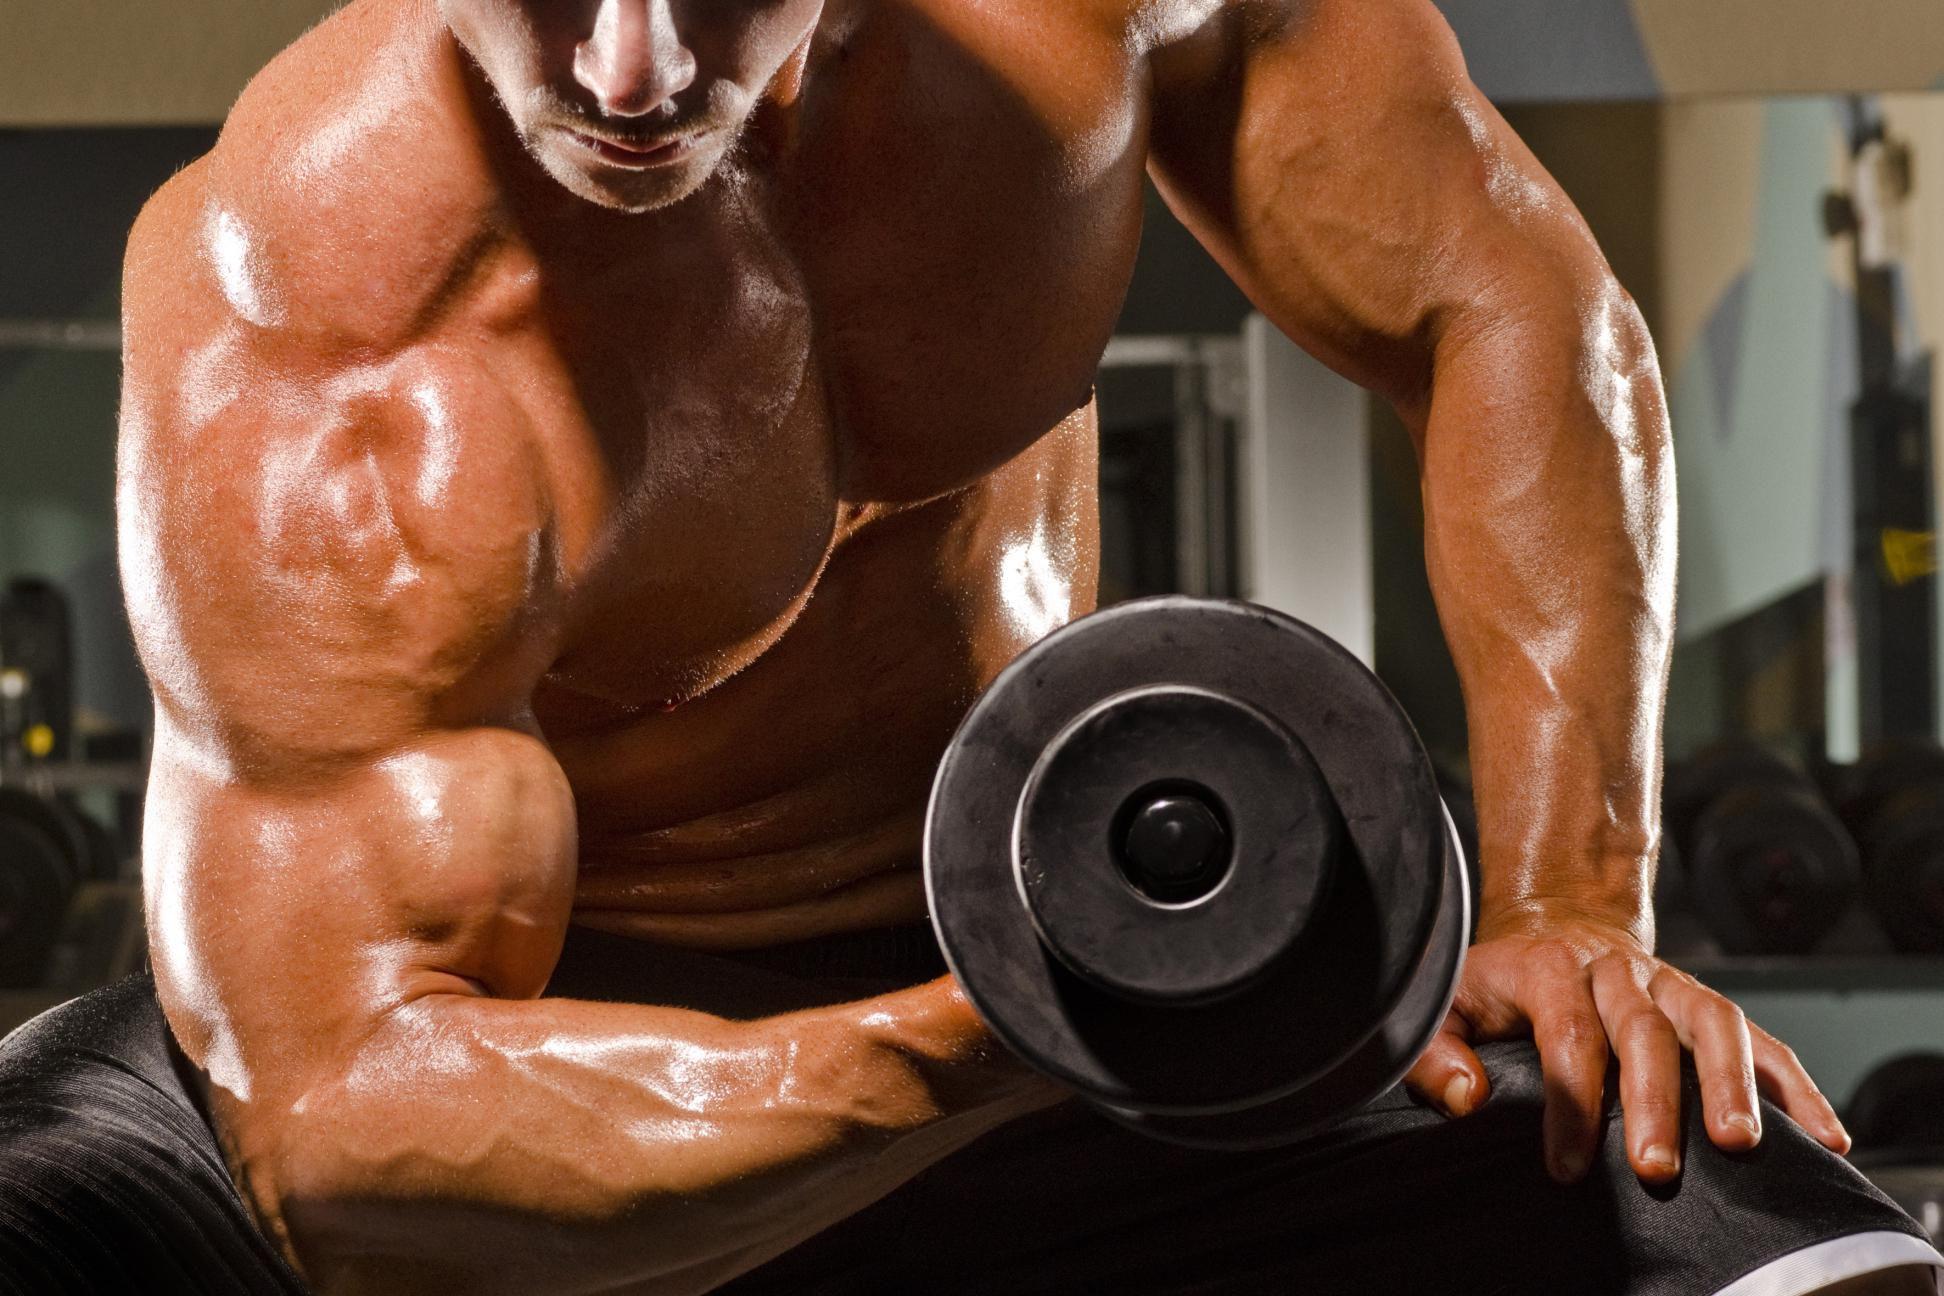 180 grams carbs body transformation diet